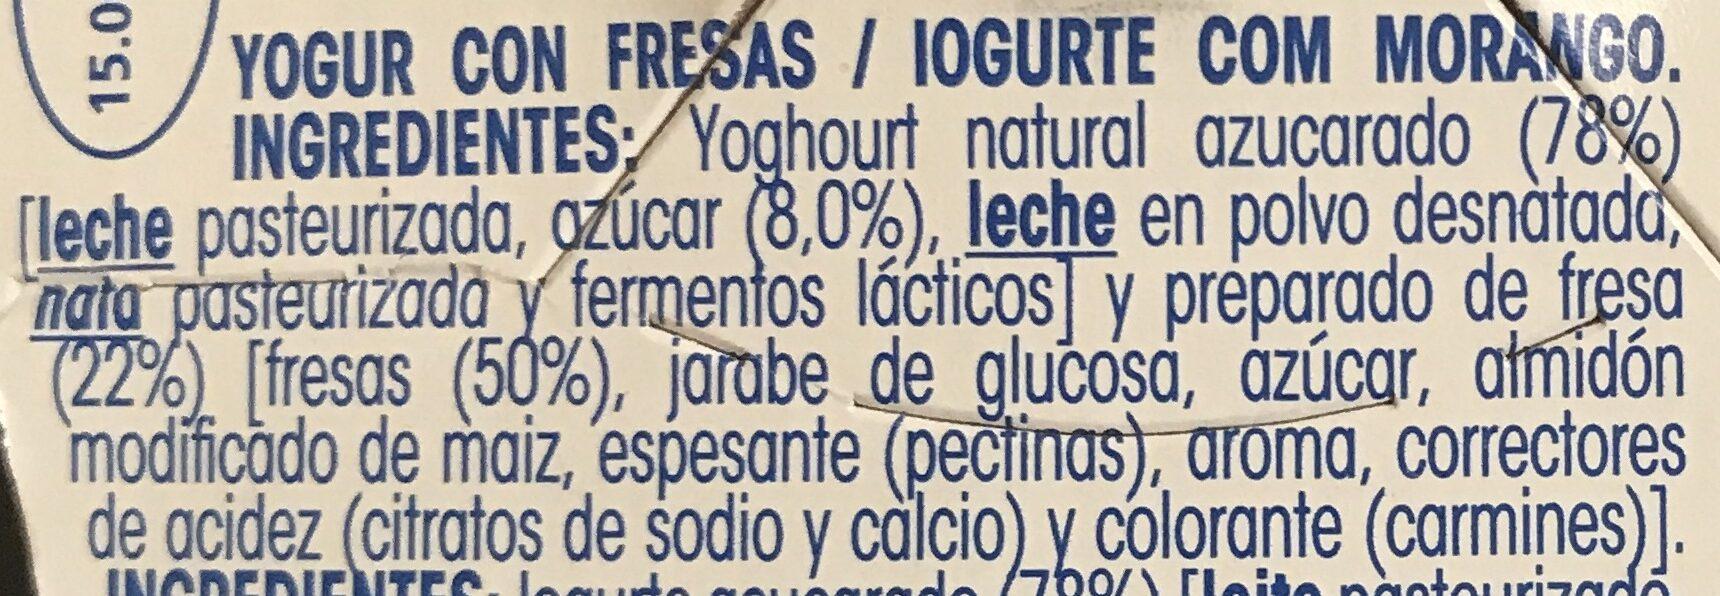 Original con fresas - Ingrediënten